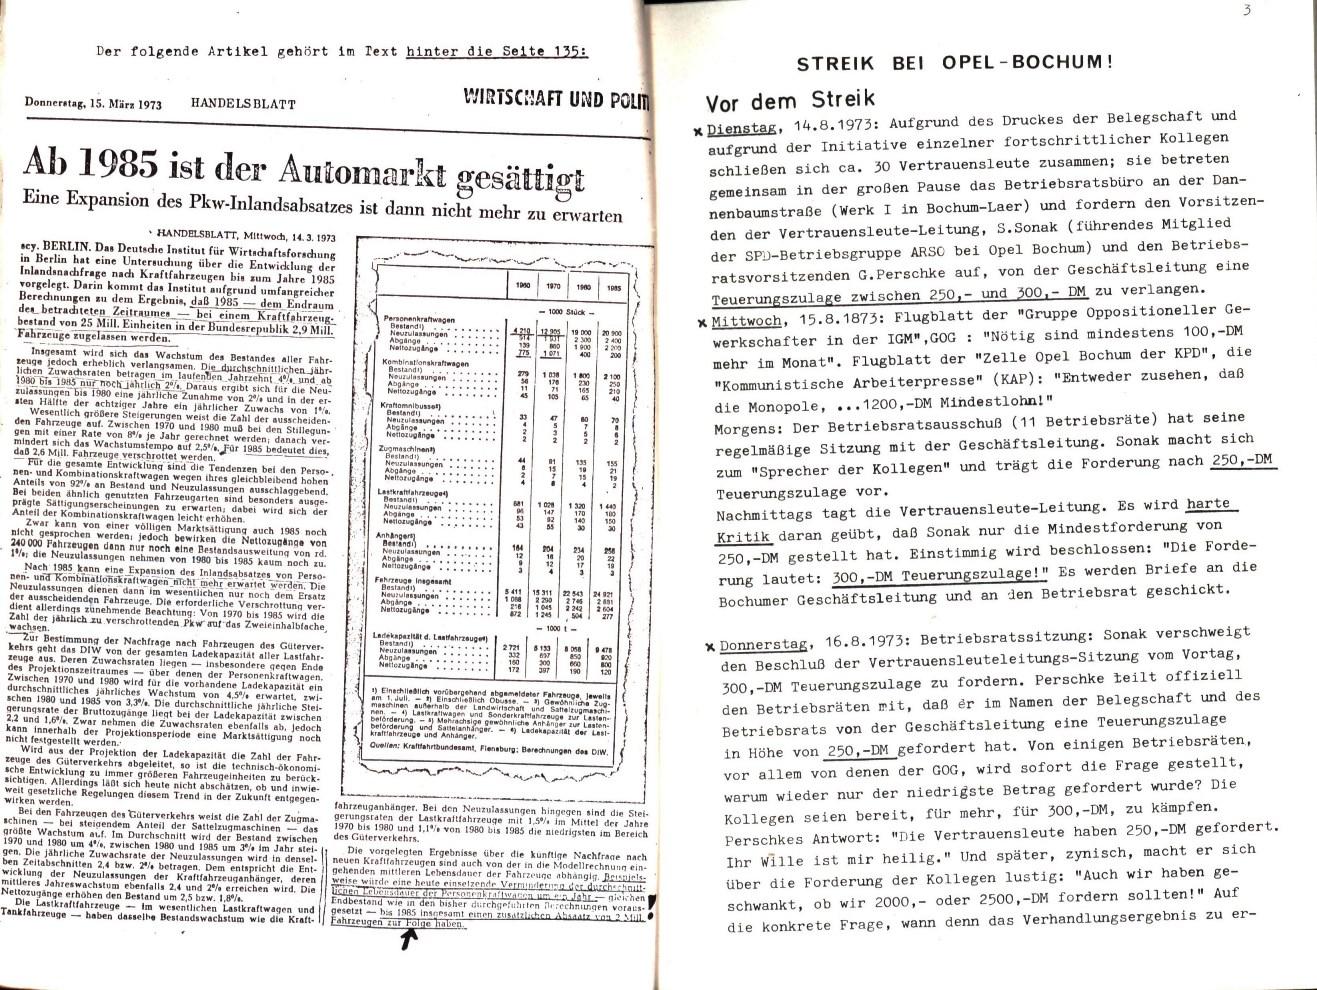 Bochum_IGM_Opel_PG_Opel_streikt_1973_003